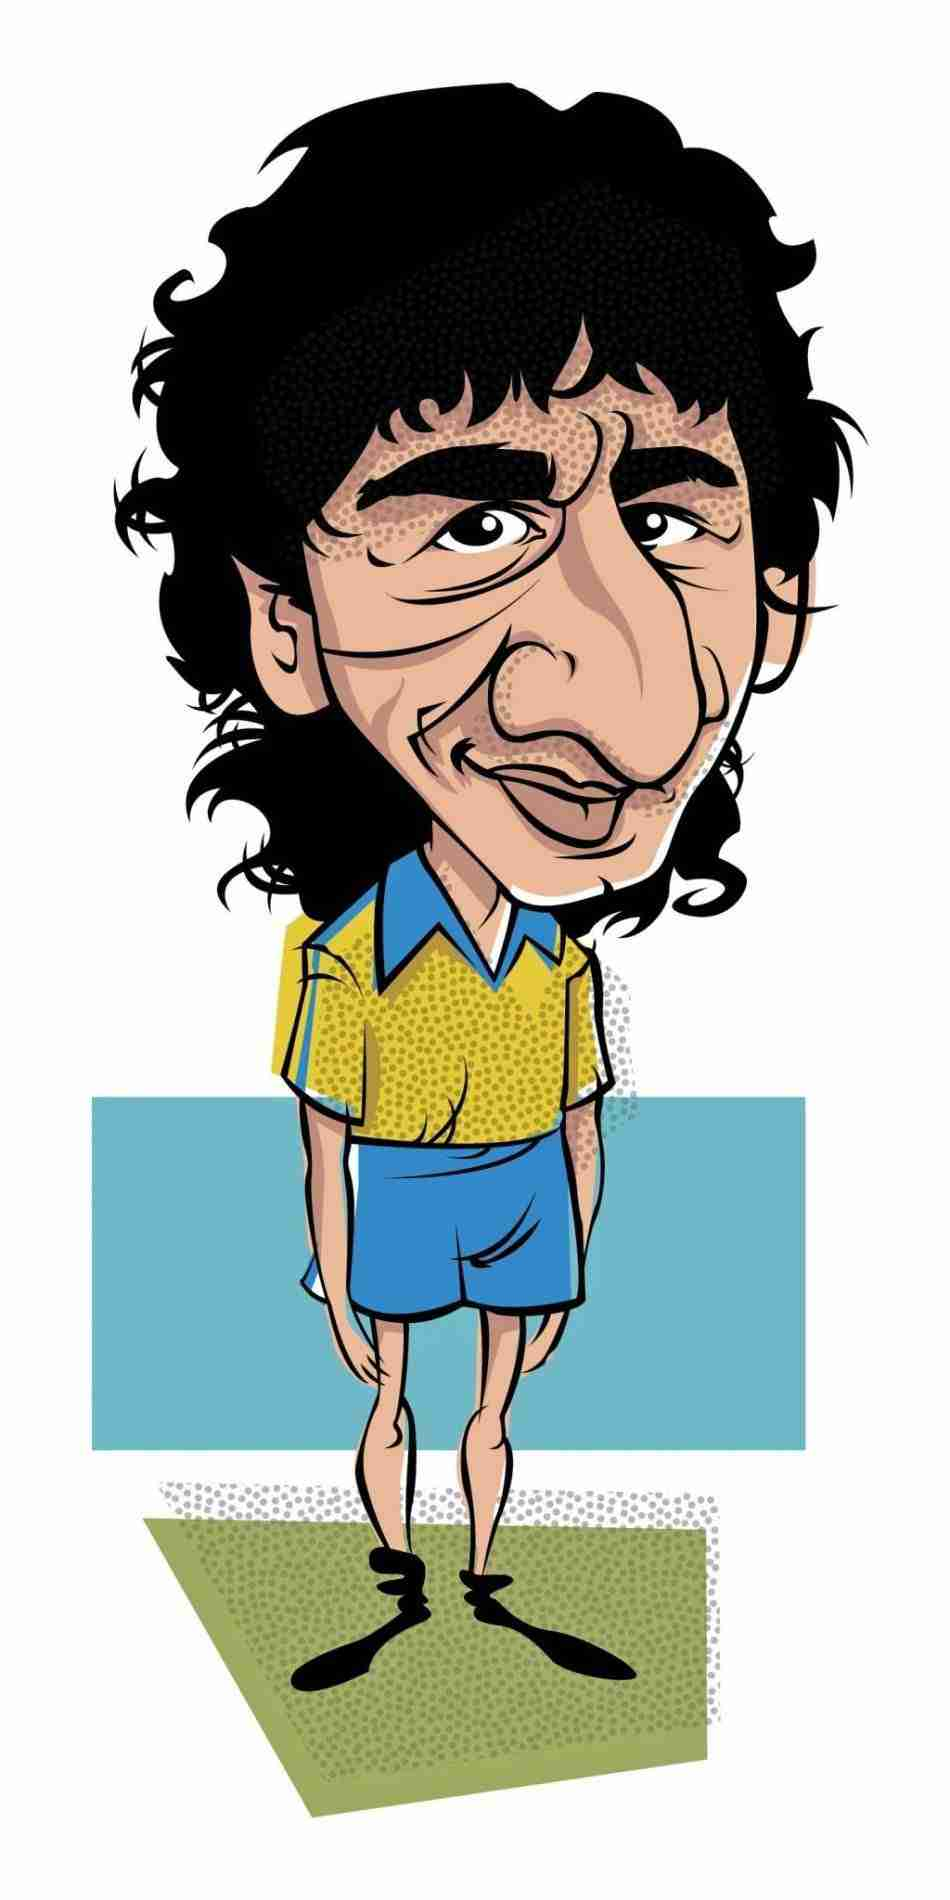 Mágico González por Juan Carlos Esteban